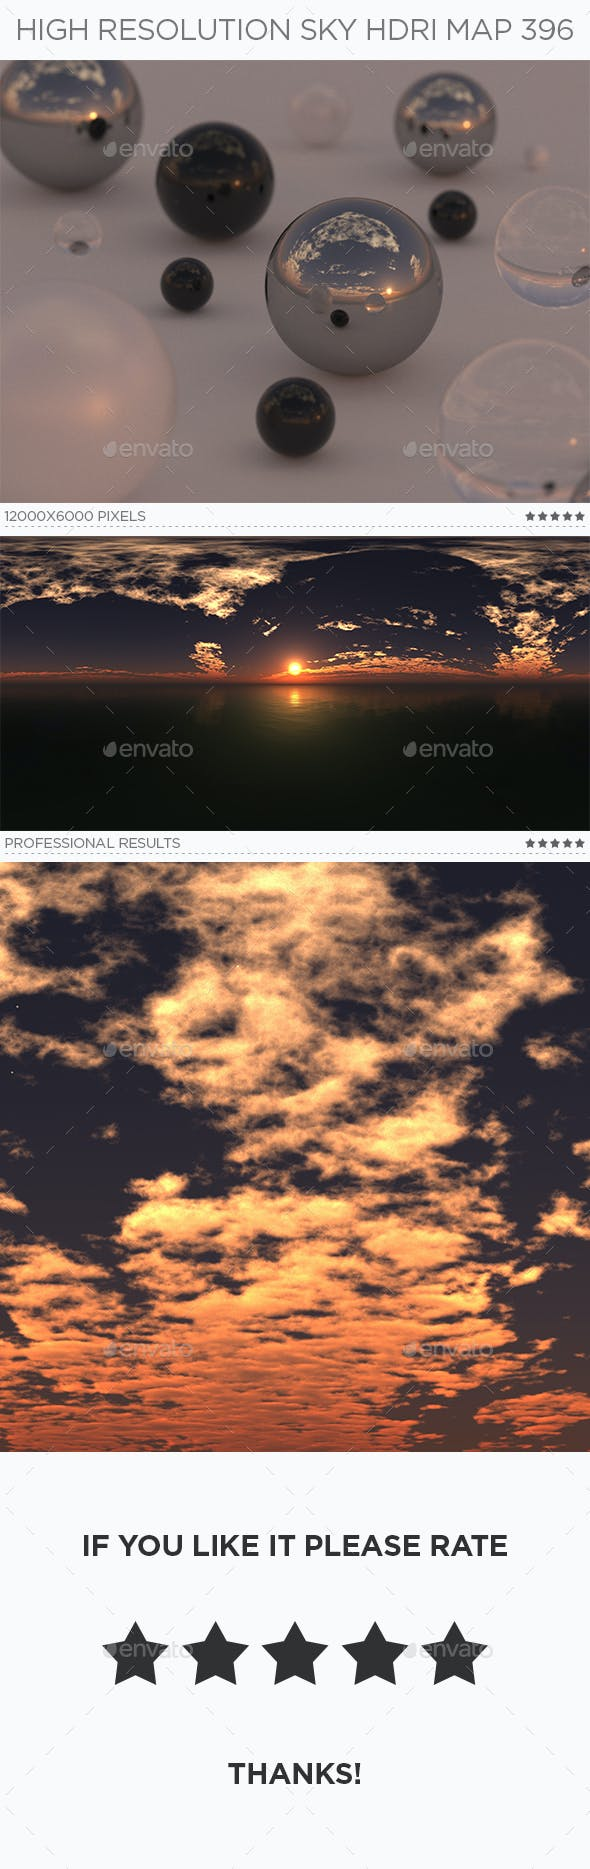 High Resolution Sky HDRi Map 396 - 3DOcean Item for Sale